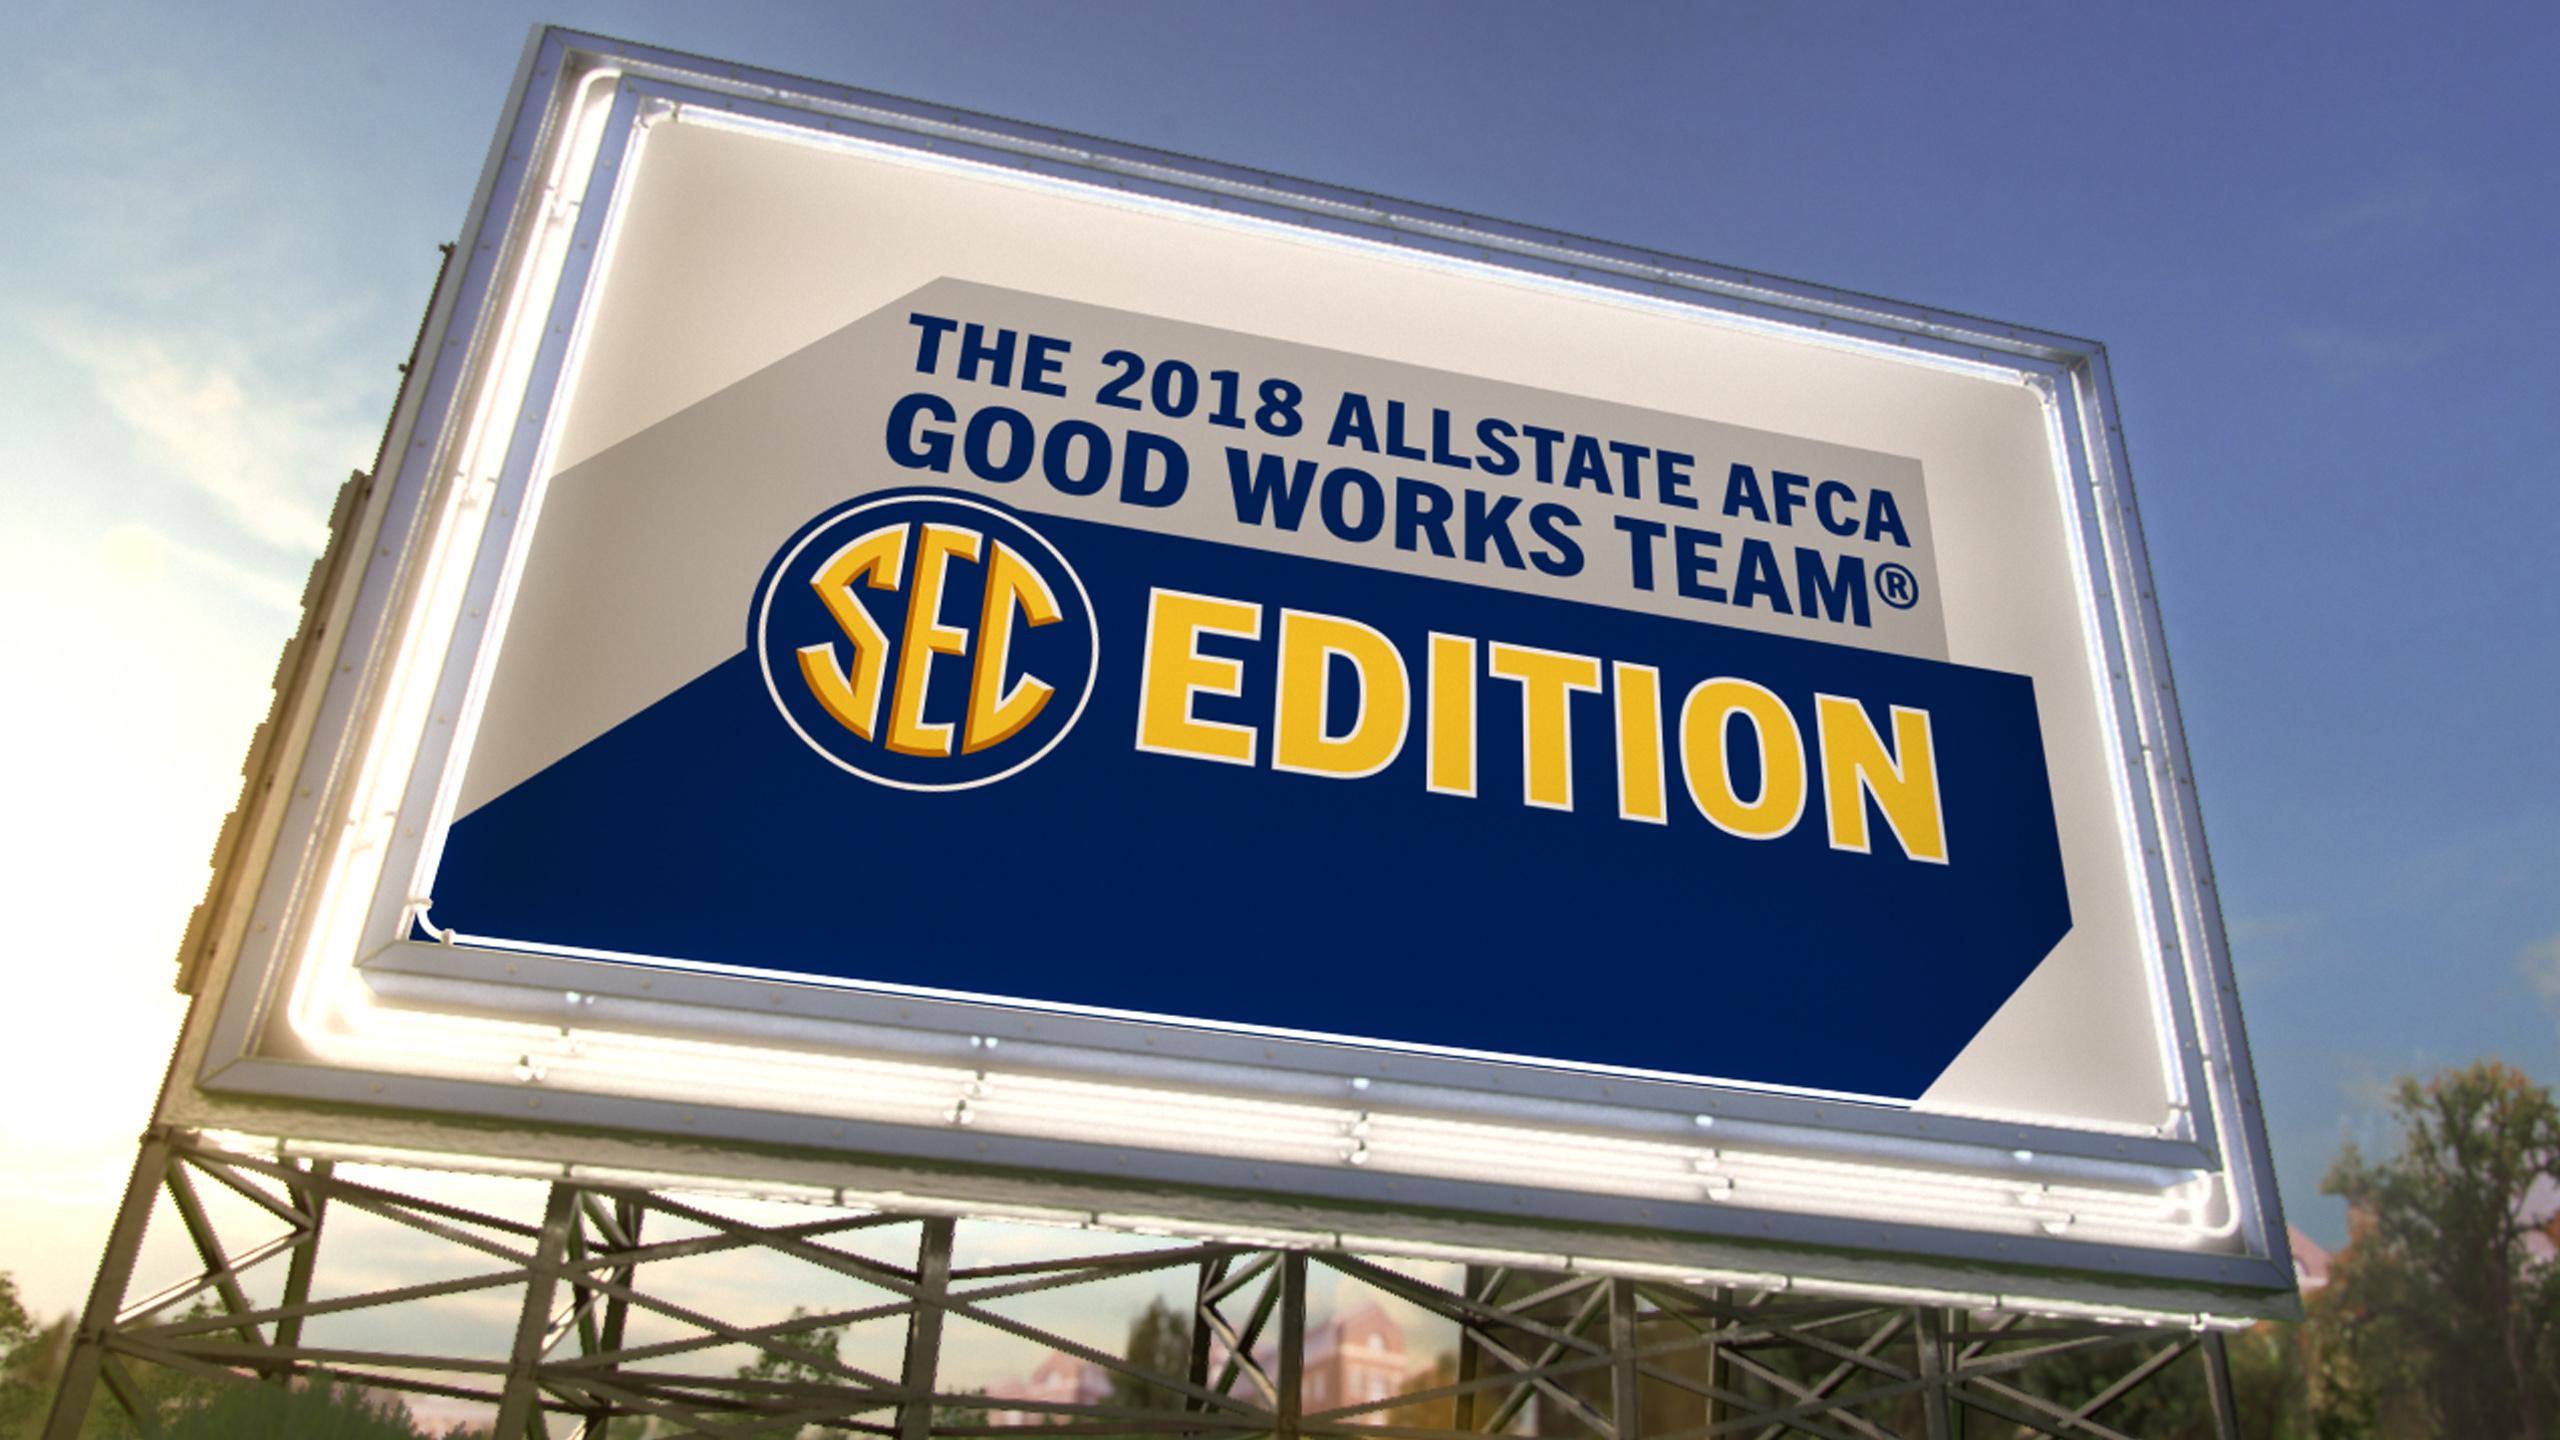 The AllState AFCA Good Works Team - SEC Edition